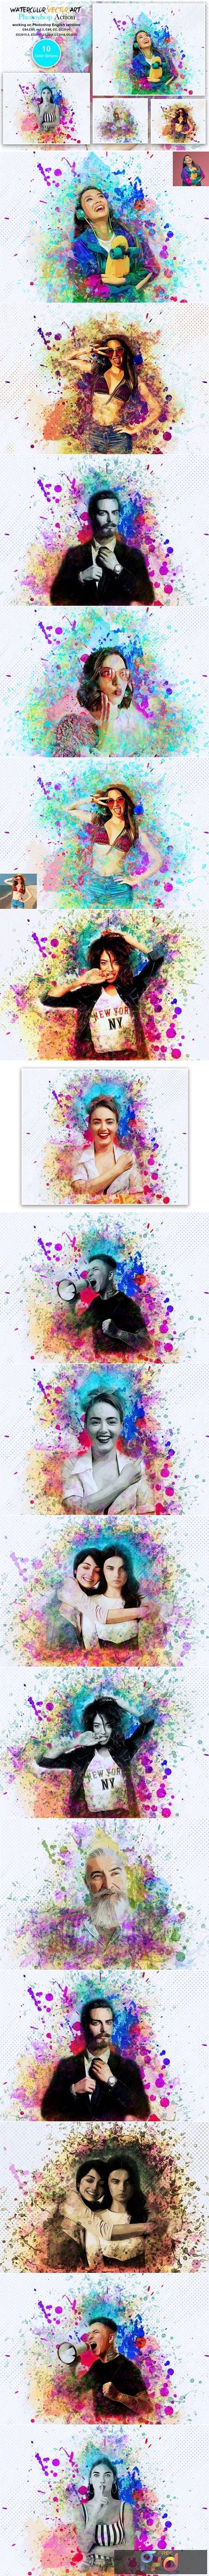 Watercolor Vector Art PS Action 5566054 1